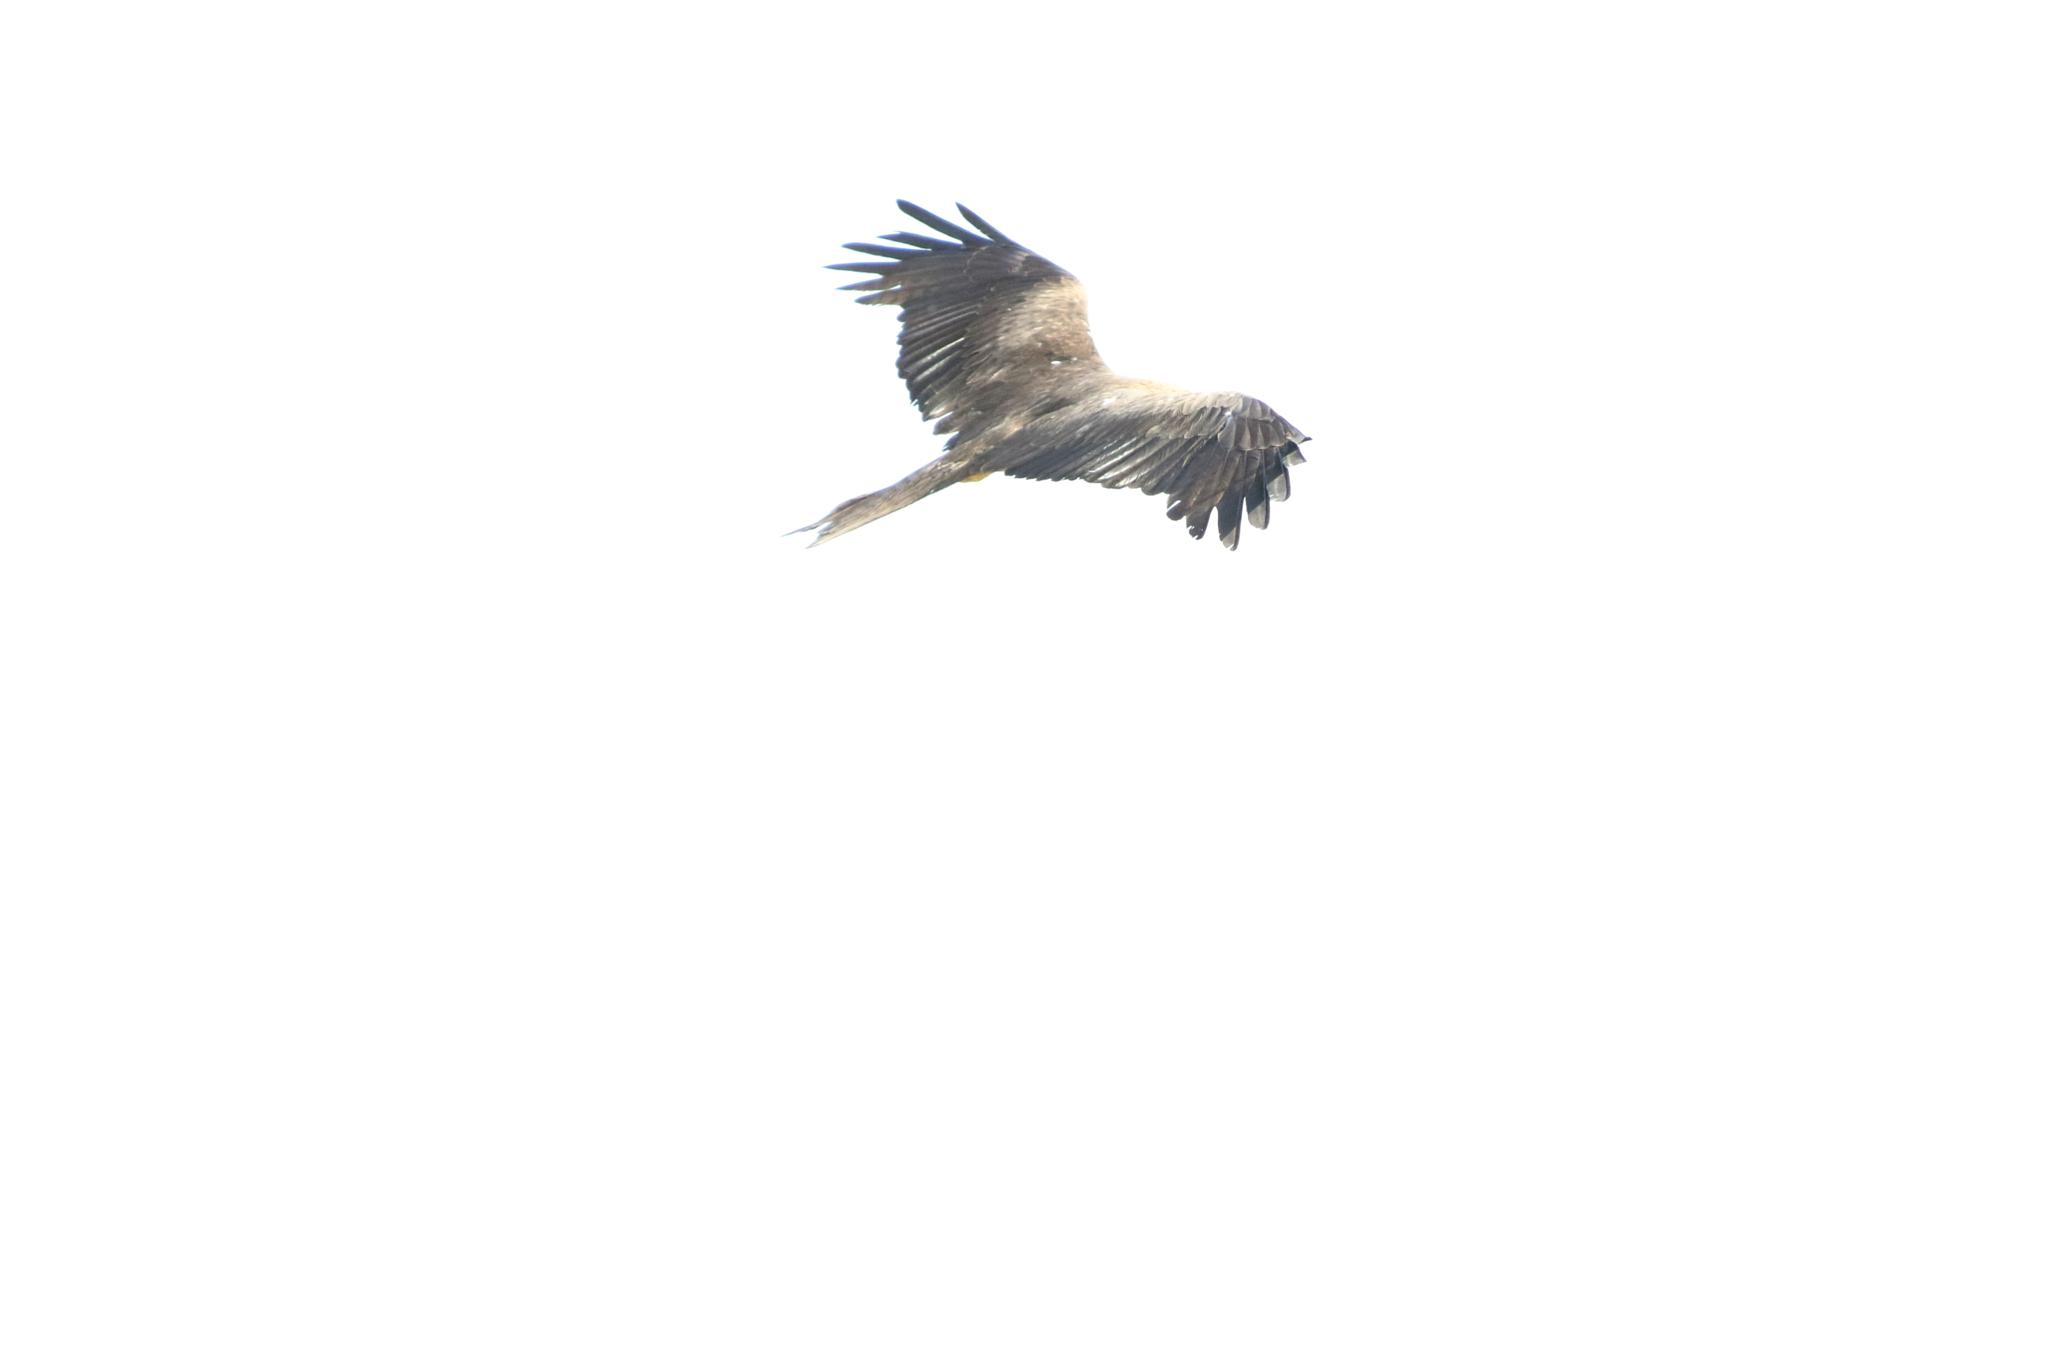 Eagle by Pranav Desai